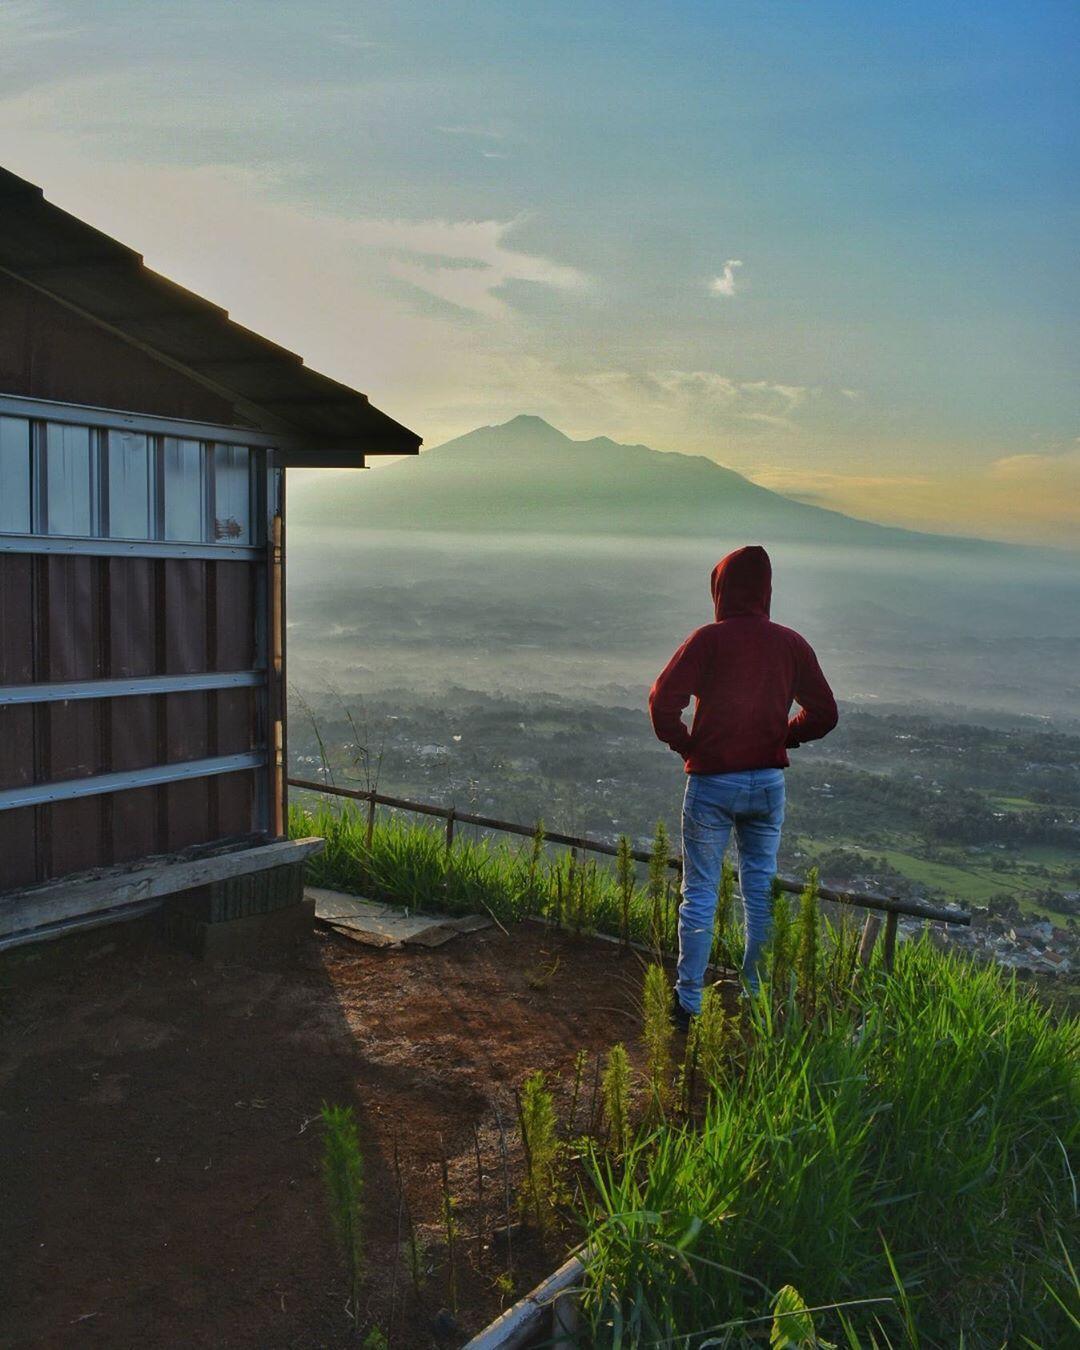 Bukit Alesano Wisata Pemandangan Gemerlap Langit Malam Di 2020 Langit Malam Langit Pemandangan